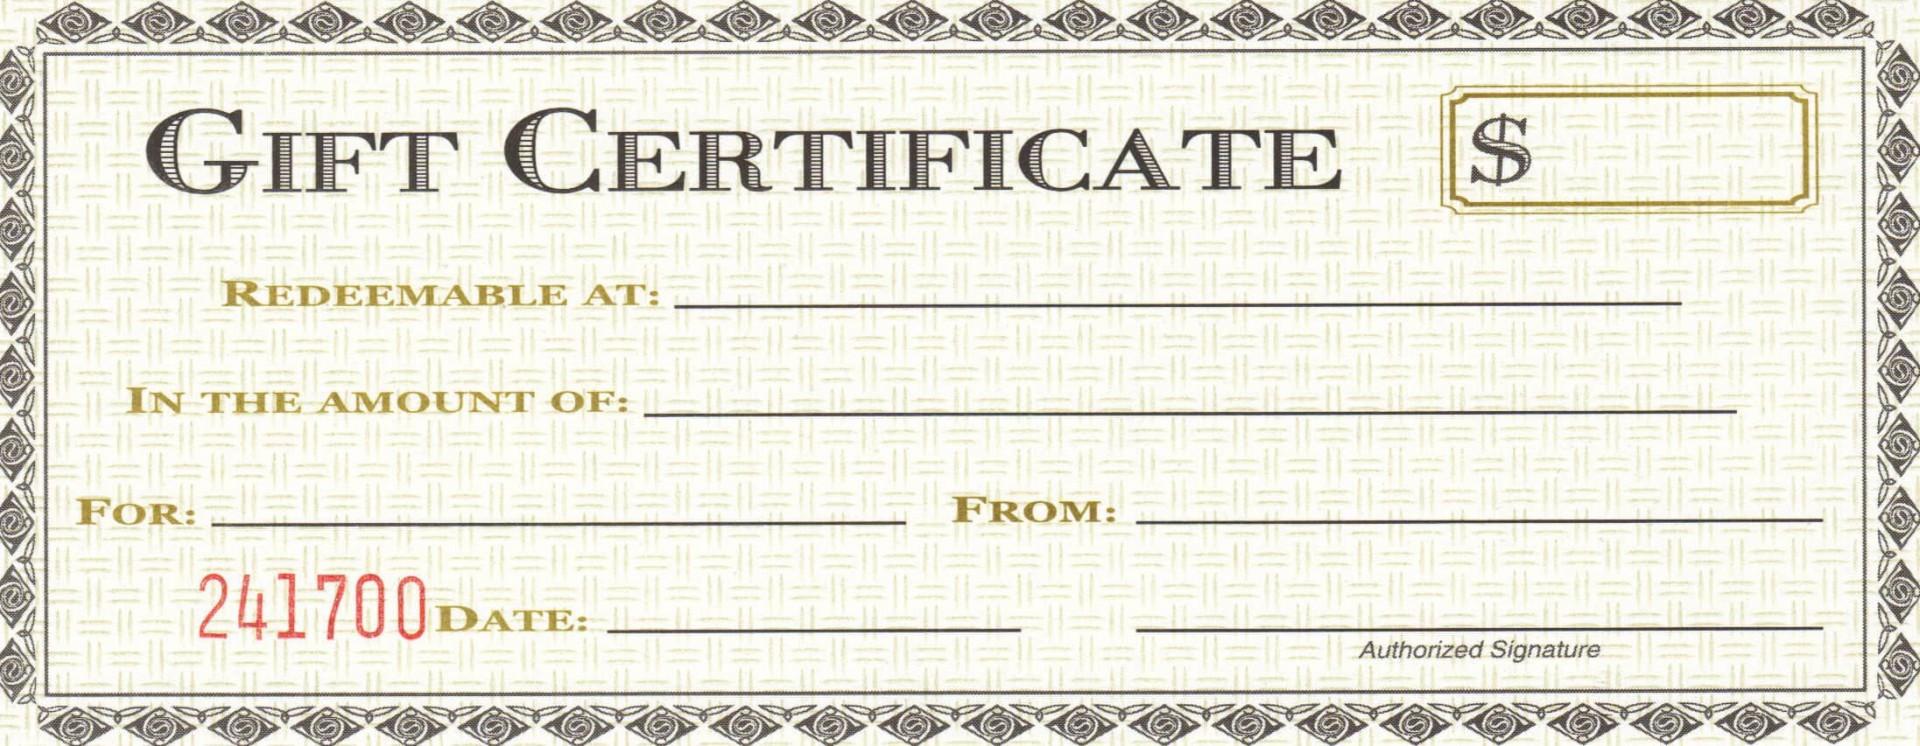 009 Remarkable Restaurant Gift Certificate Template Design  Templates Card Word Voucher Free1920